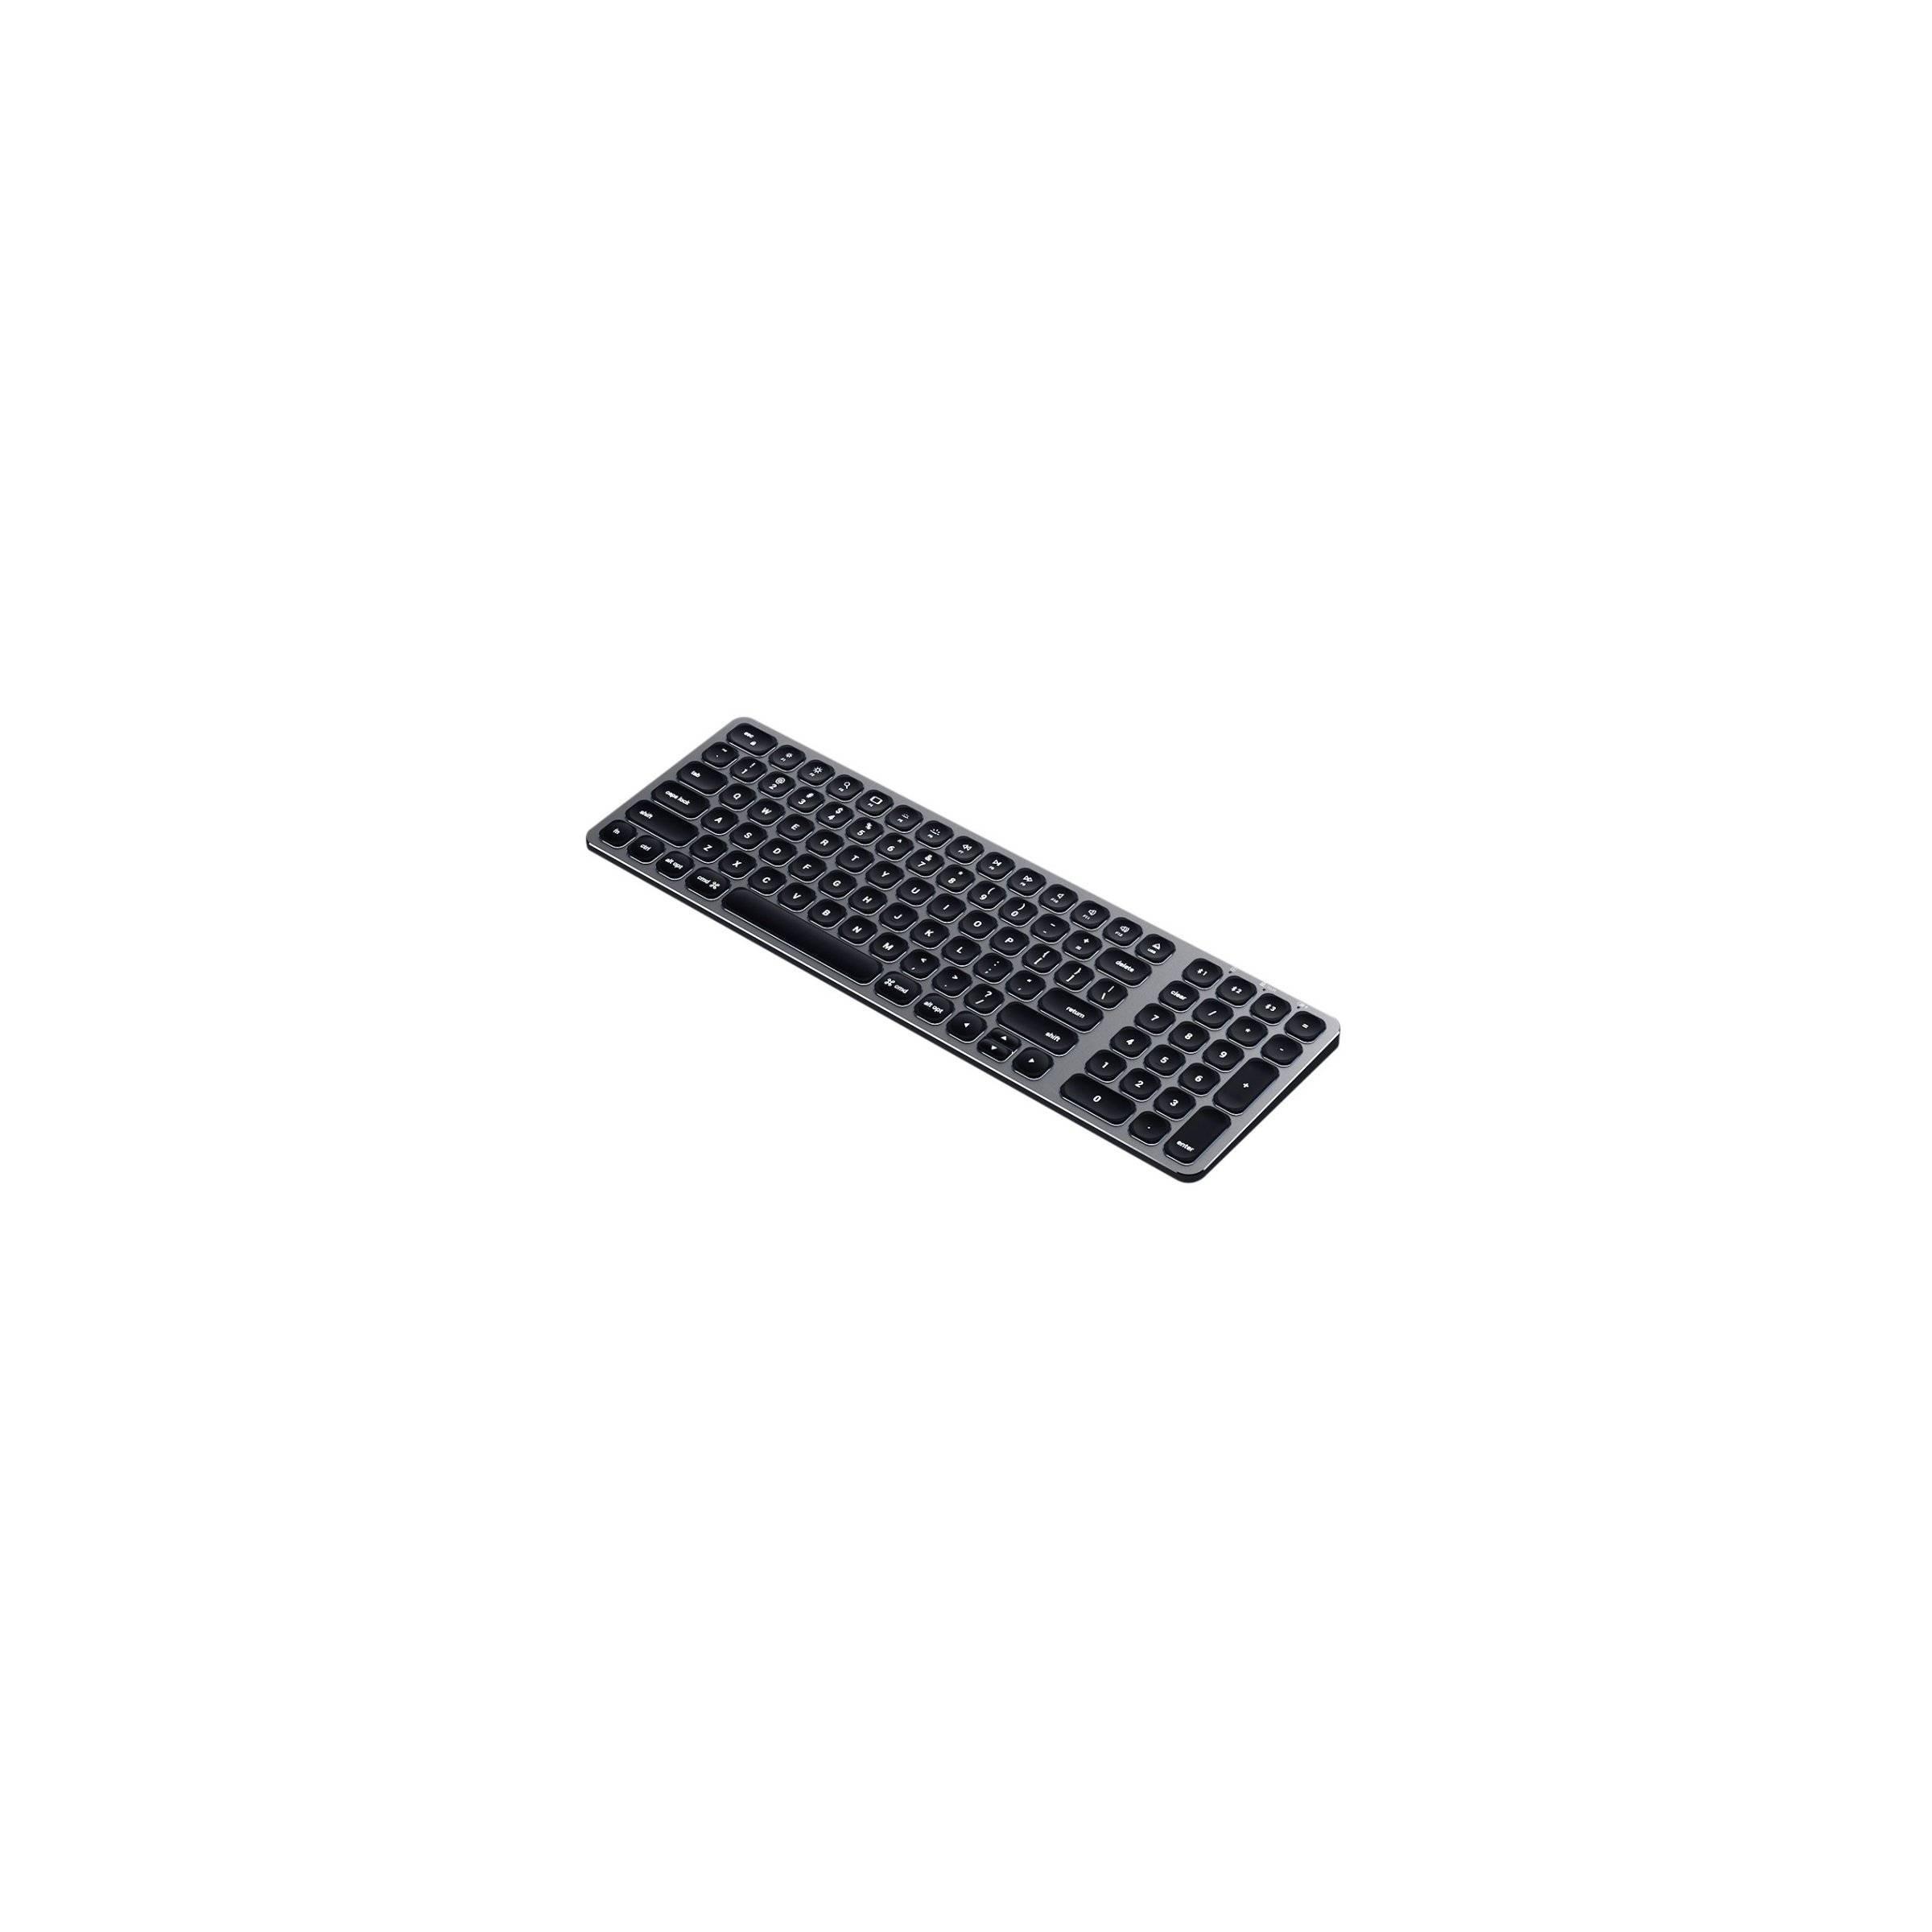 satechi – Satechi trådløs bt tastatur nordic layout (m. baggrundsbelysning) på mackabler.dk